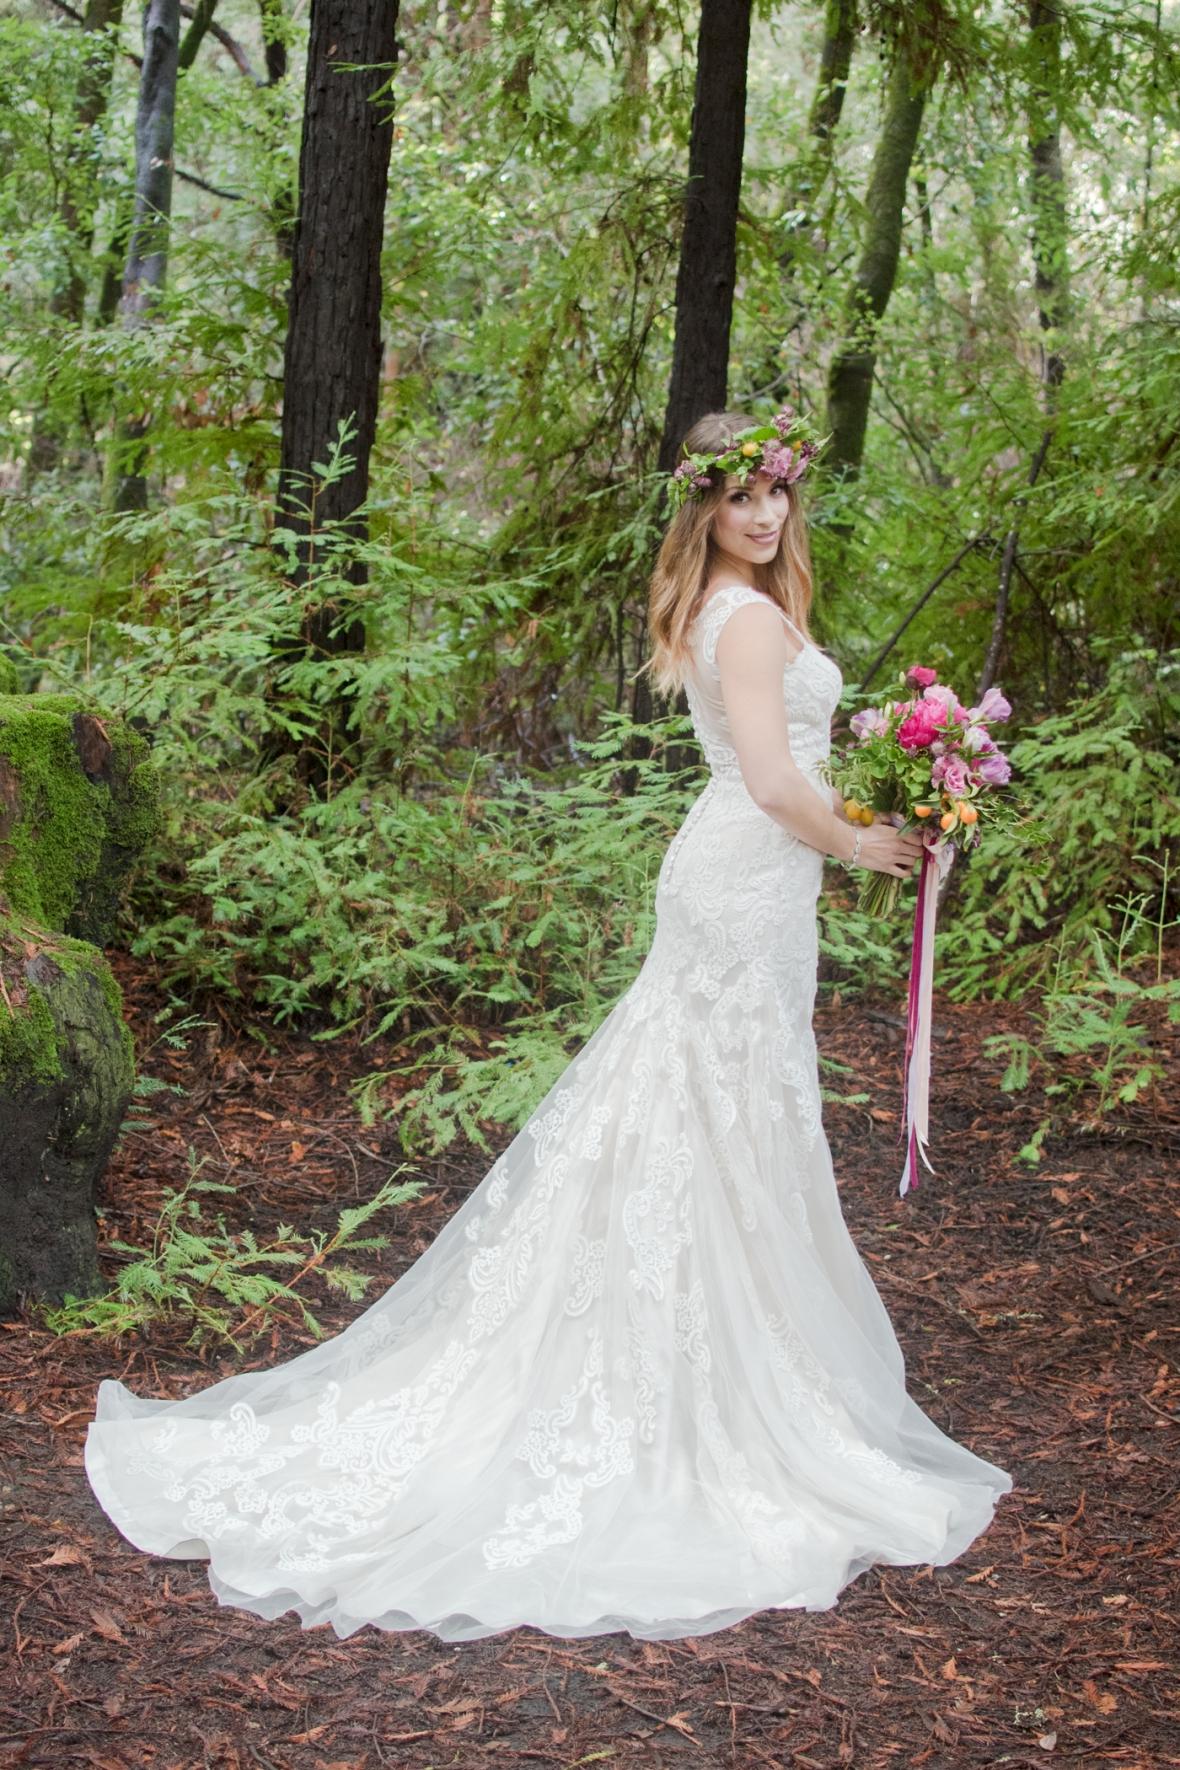 Quianna Marie Photography - Bonny Bridal Gown-51